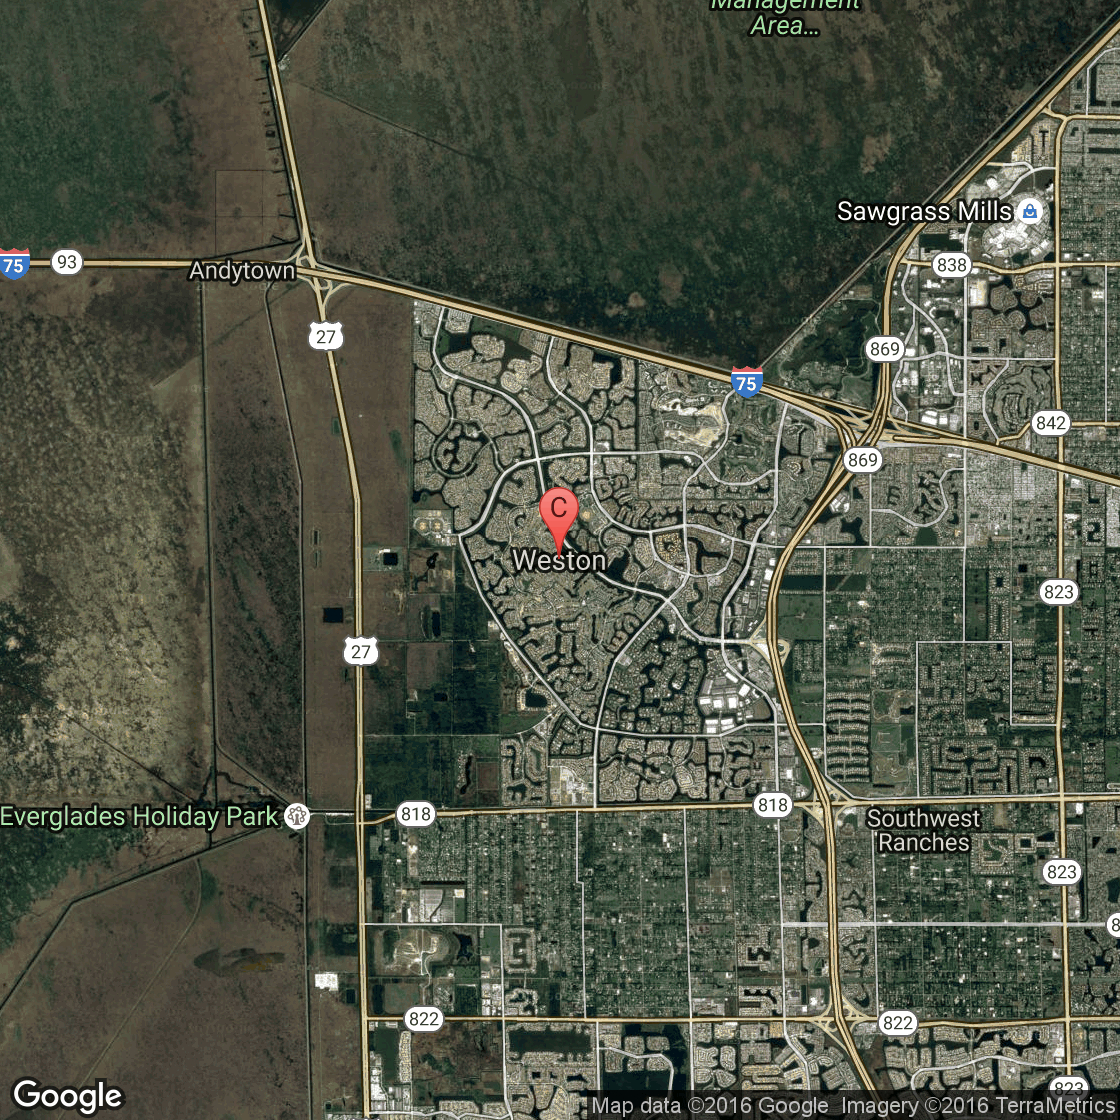 Public Golf Courses Near Weston, Florida | Usa Today - Google Maps Weston Florida